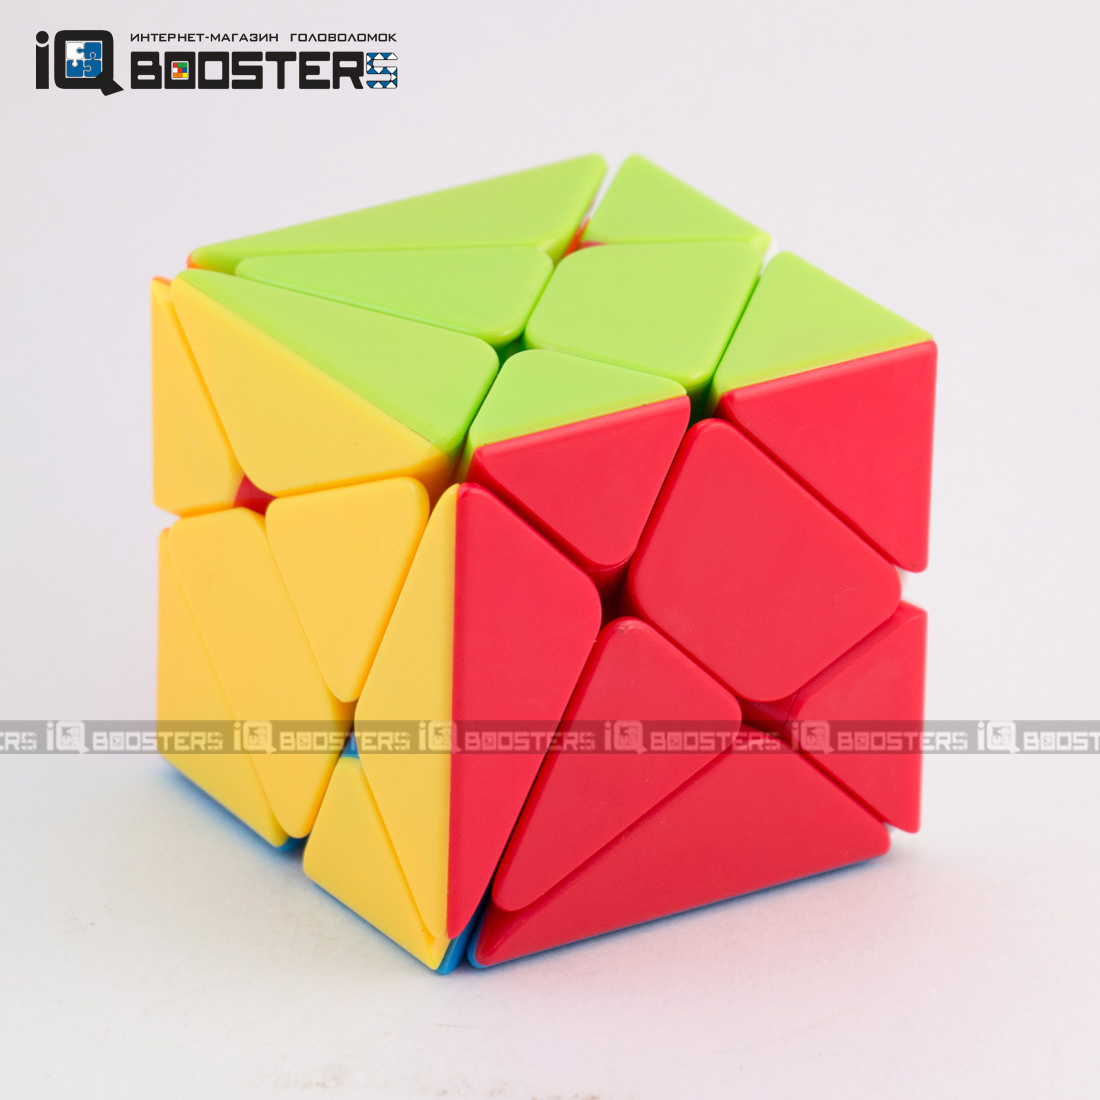 fanxin_axis_cube_1